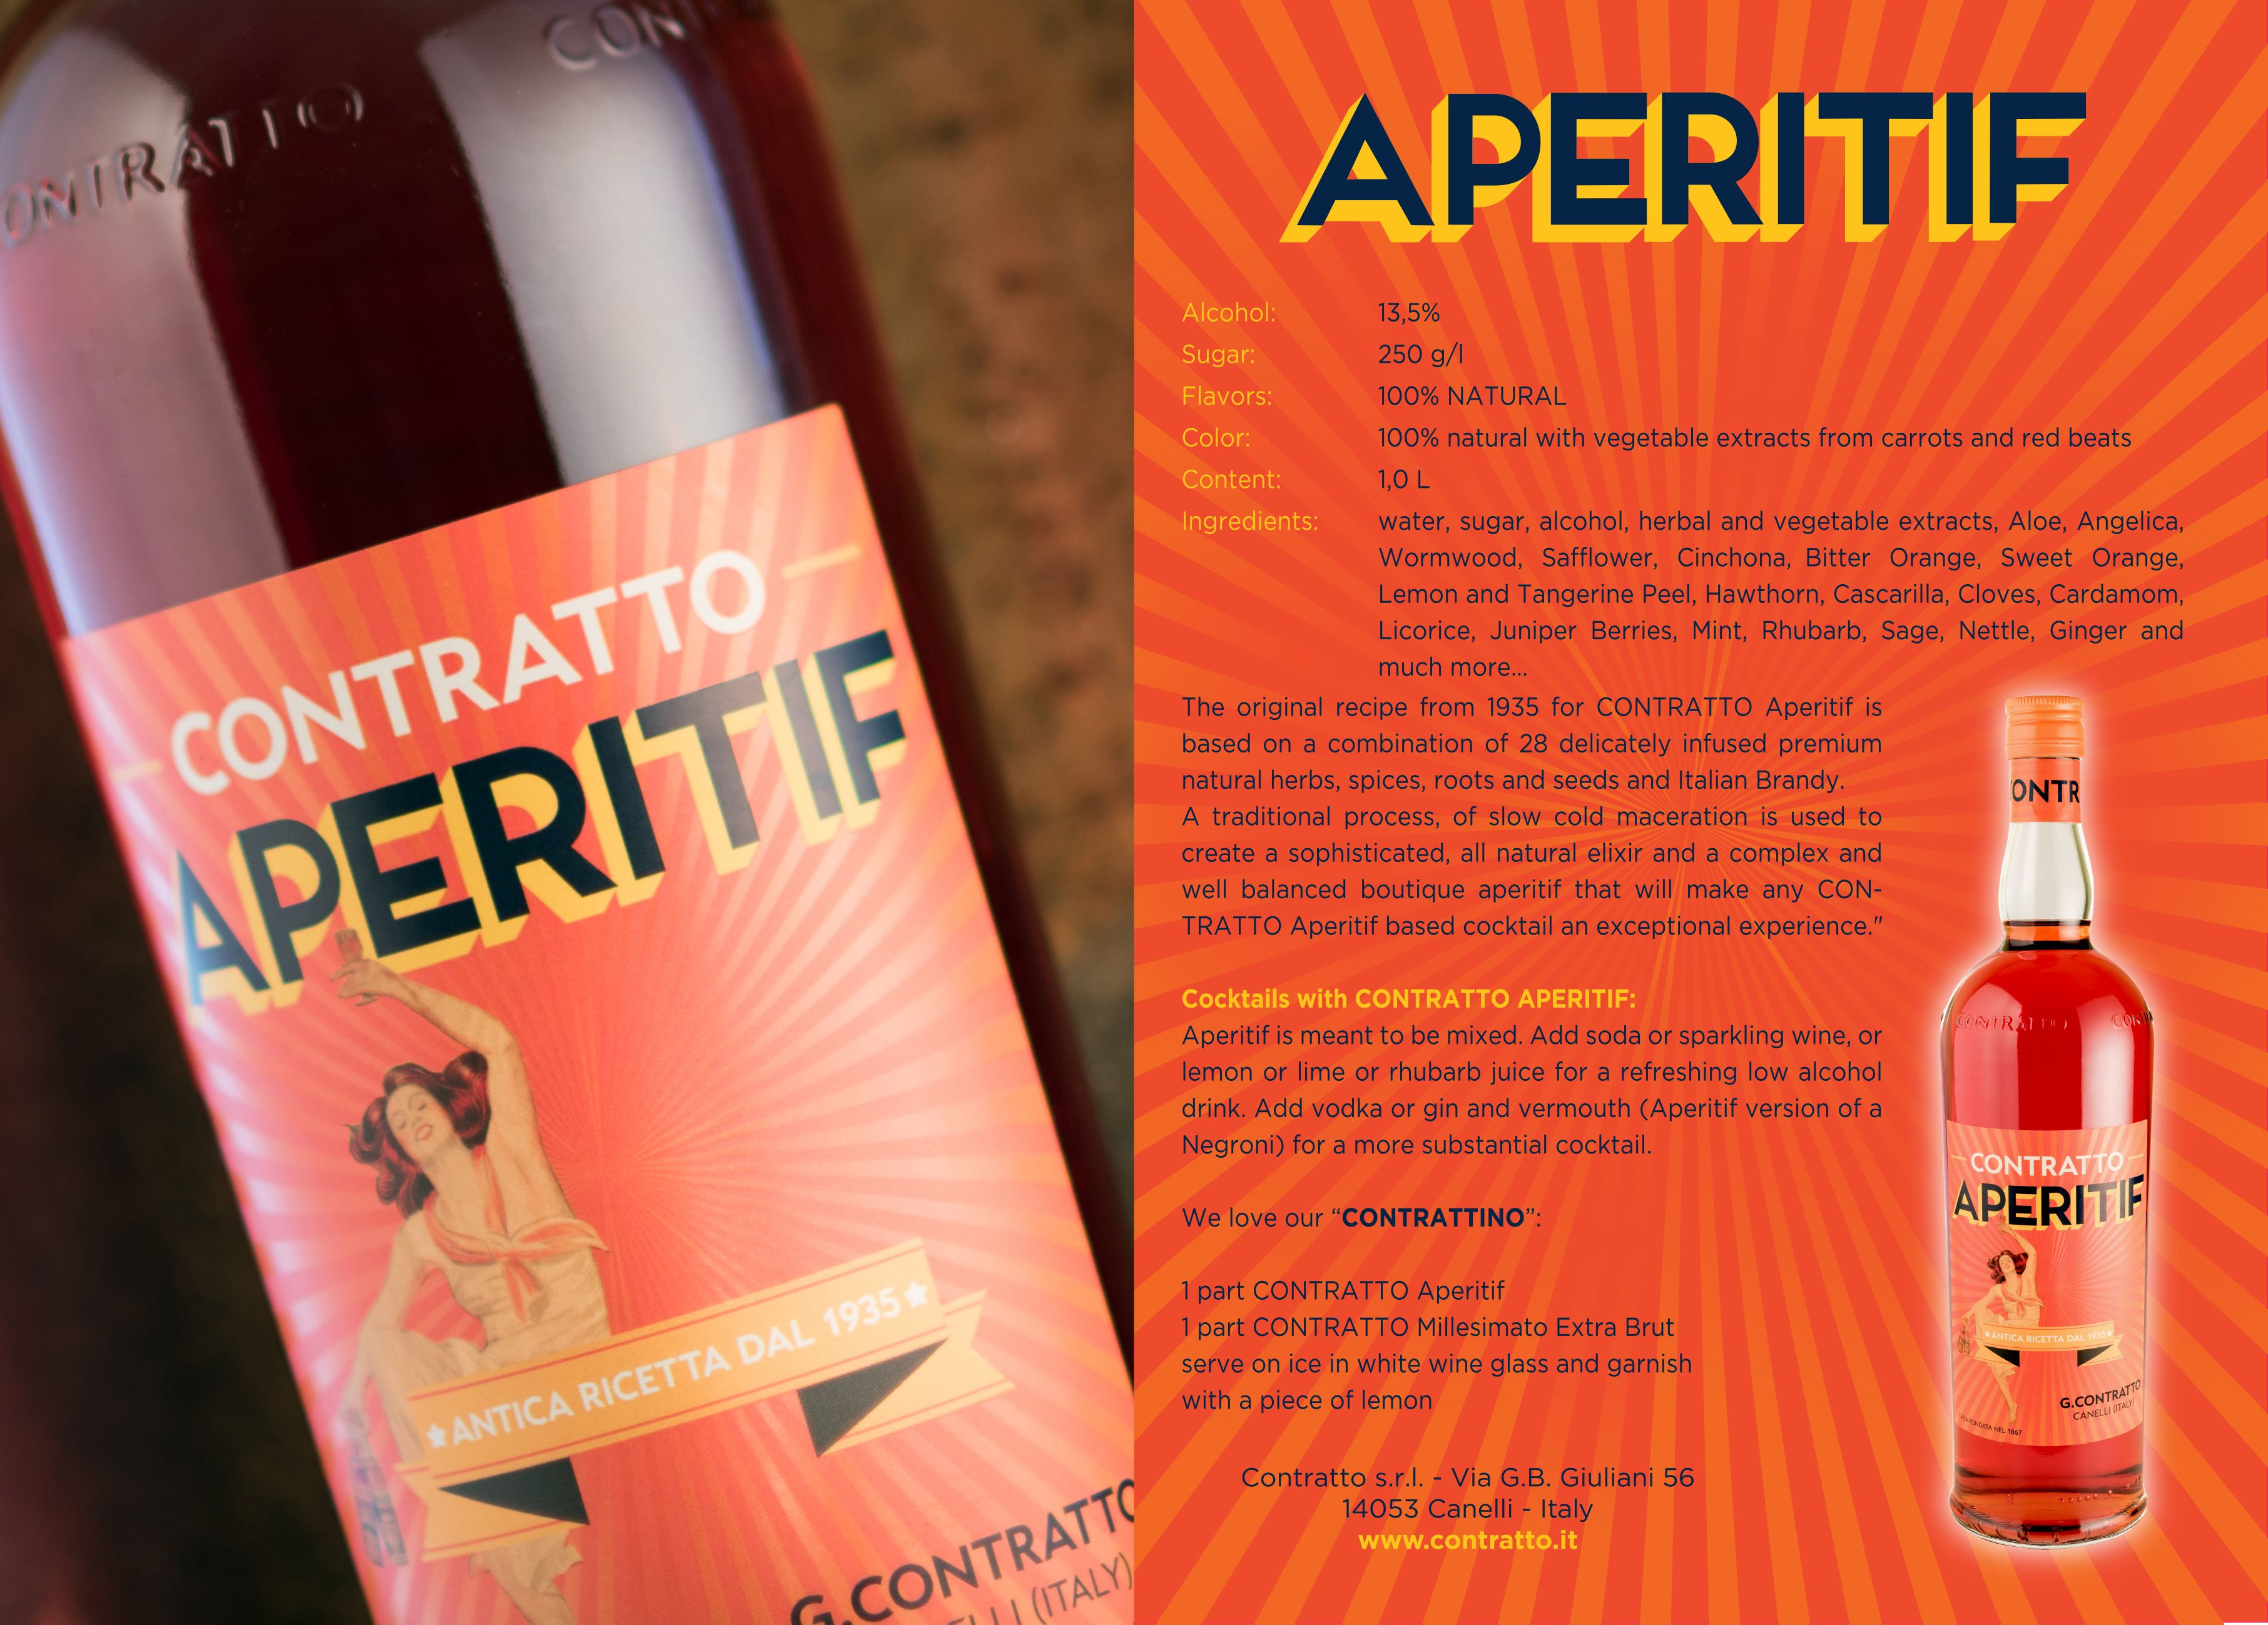 Contratto Aperitif Jpg 3625 2598 Aperitif Pisco Sour Herbalism